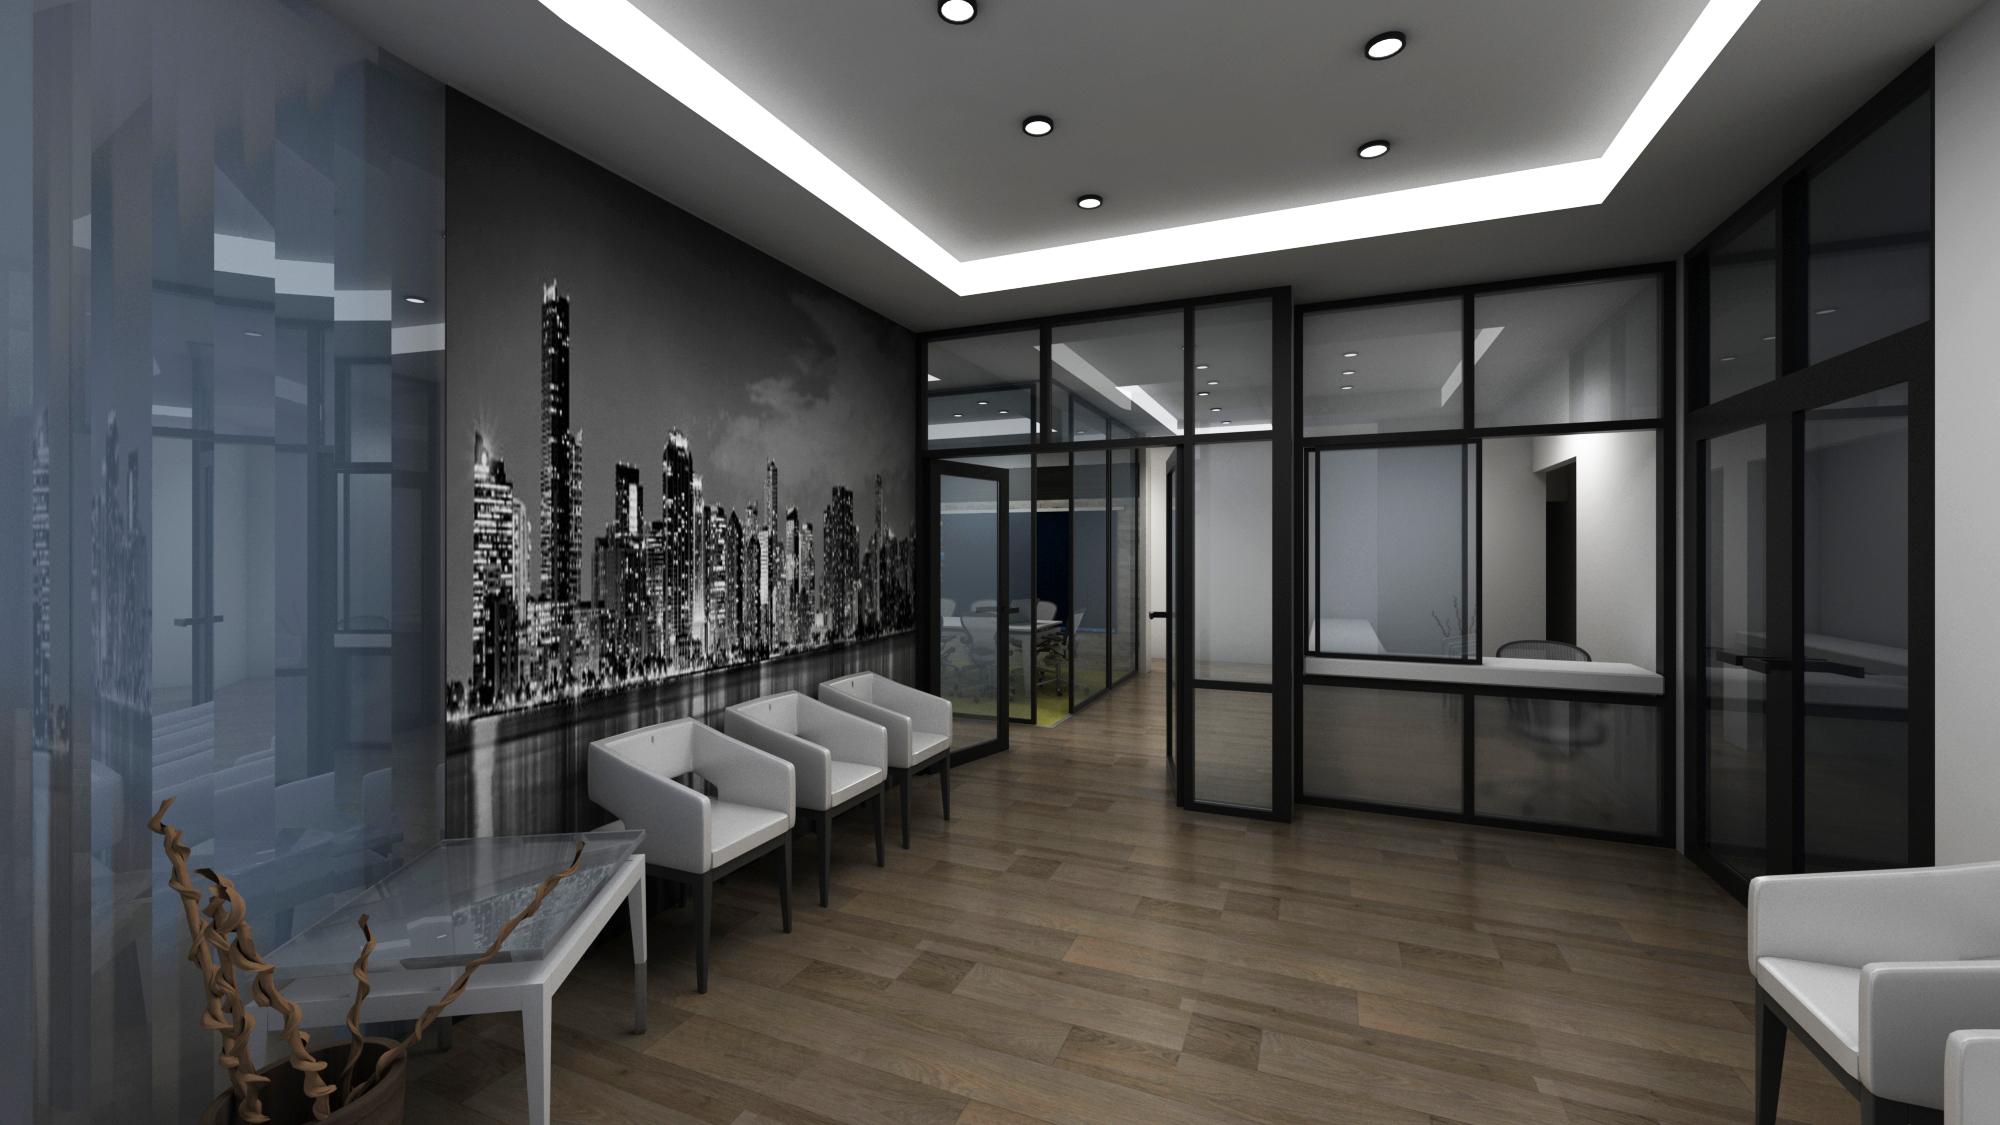 kstudio interior design cowork office space